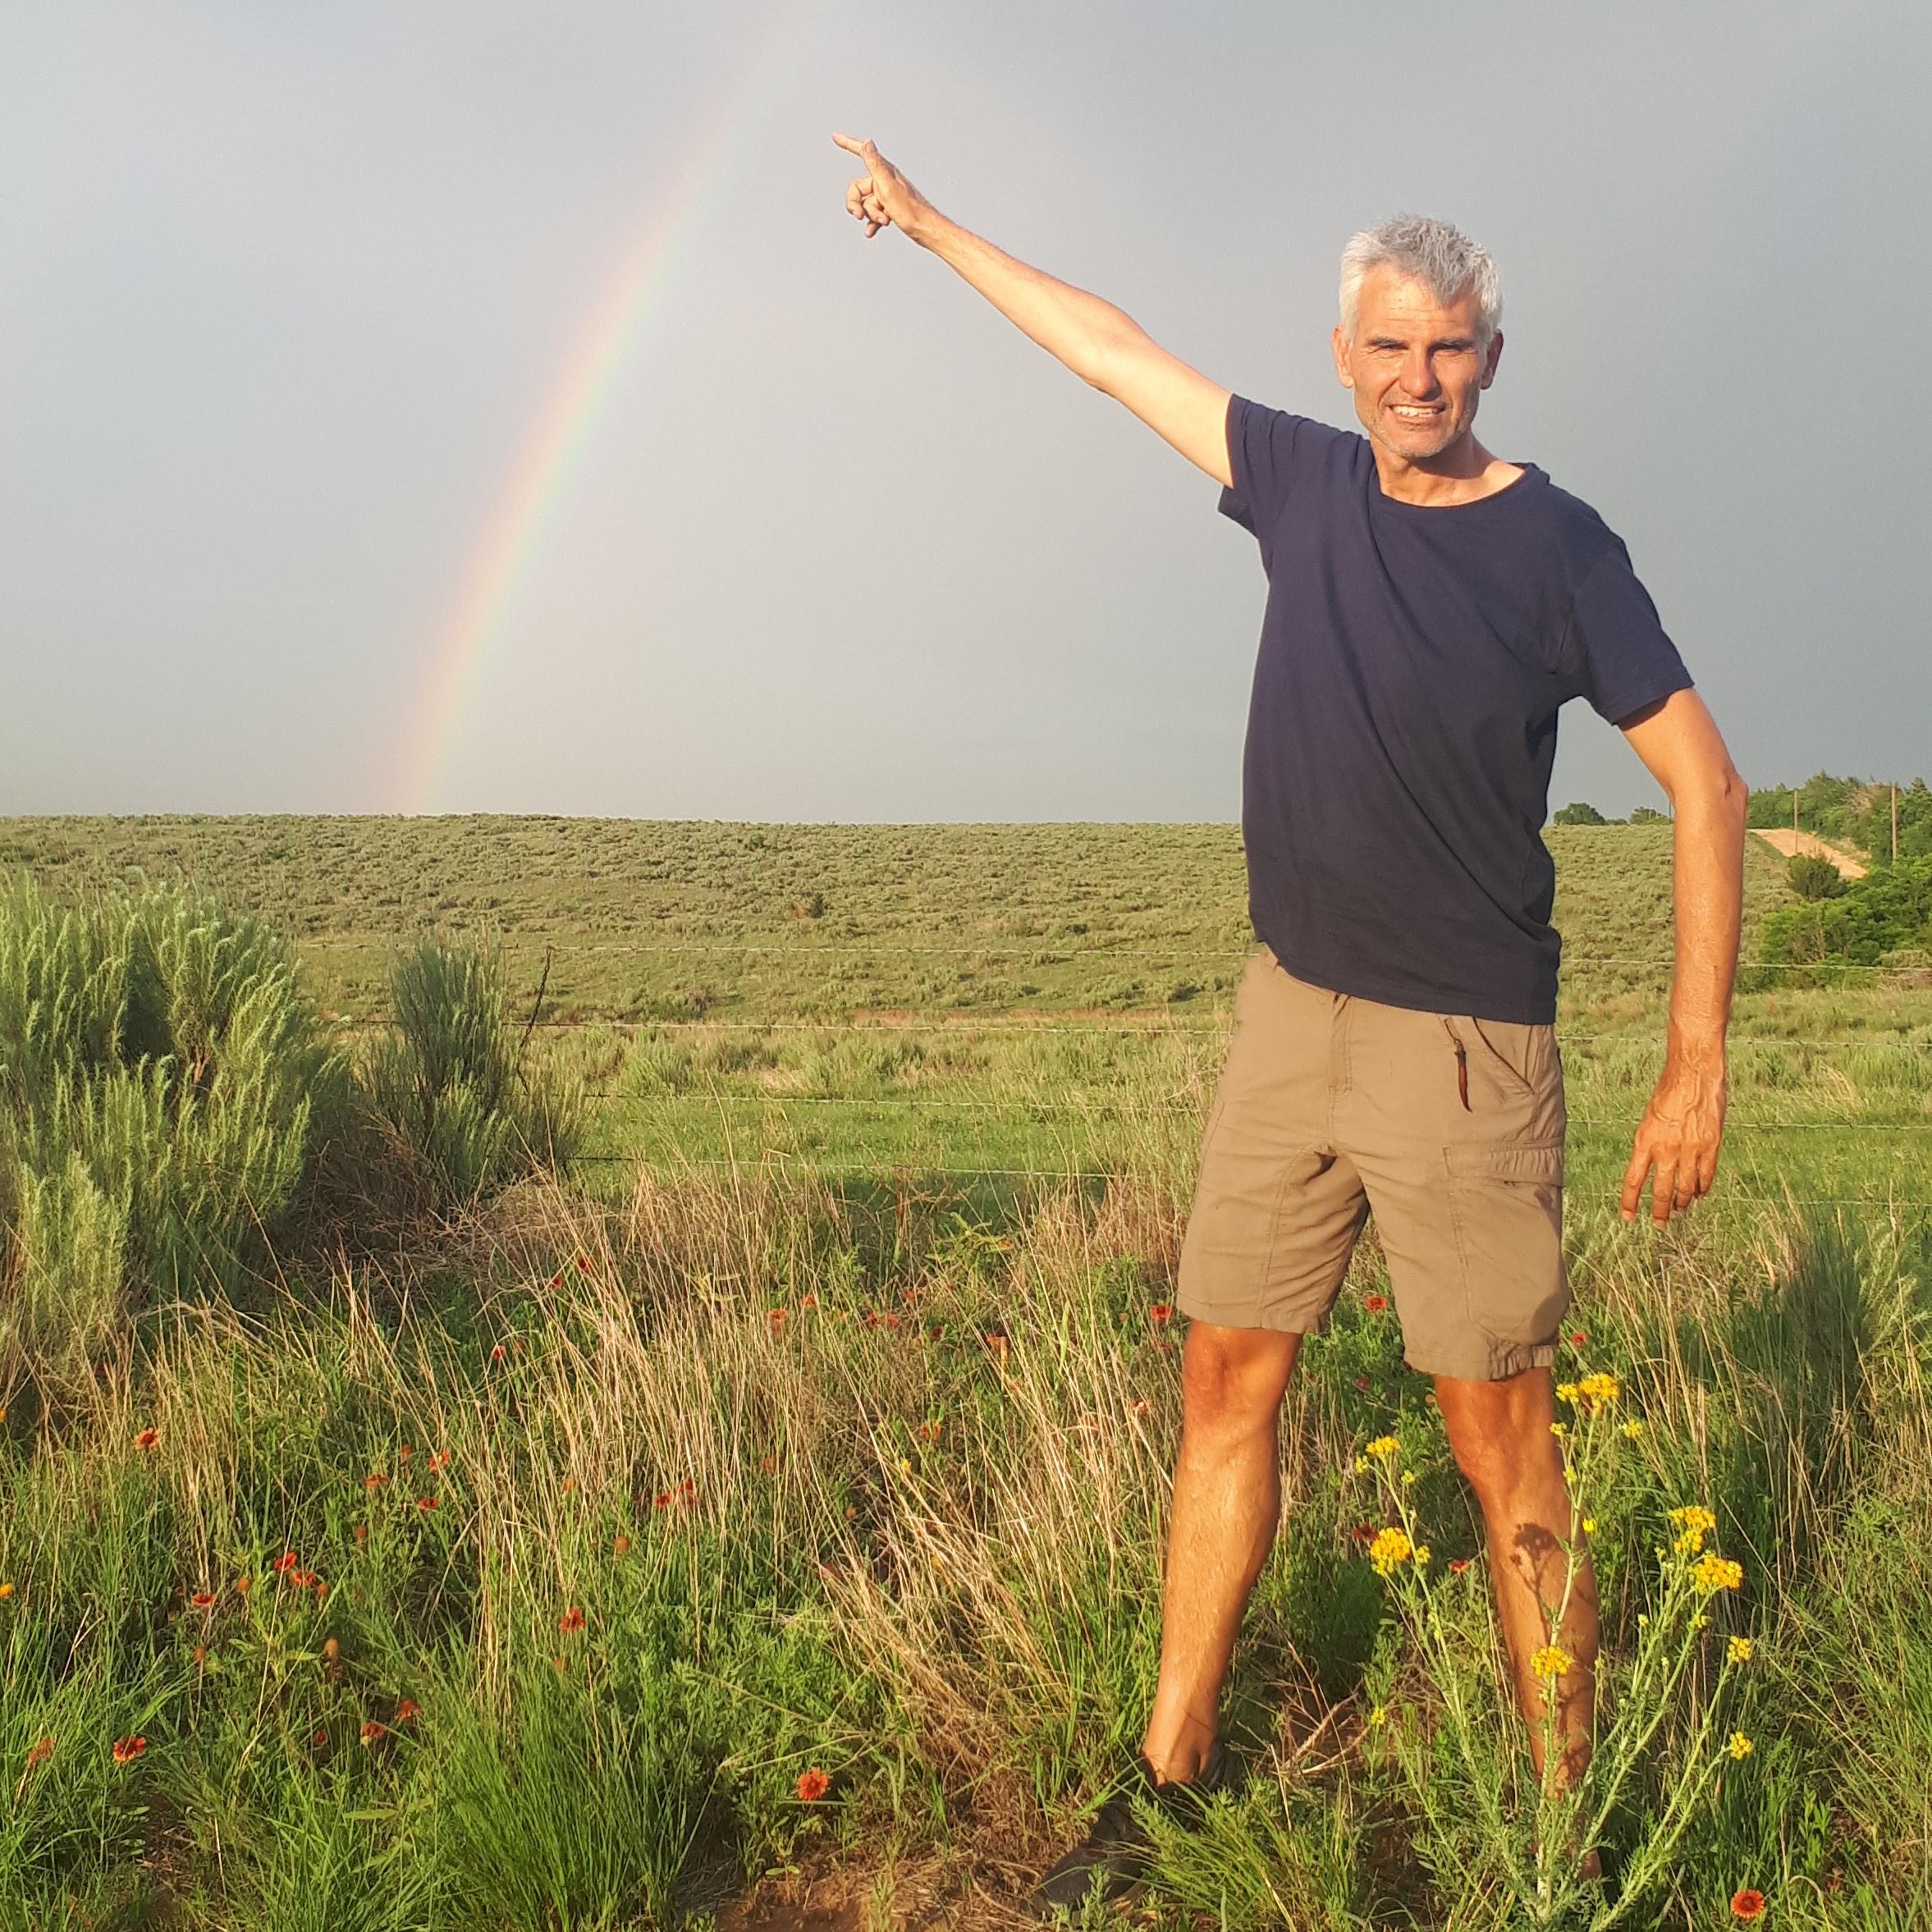 Eric Terpstra - Directeur, reisleider, meteoroloog